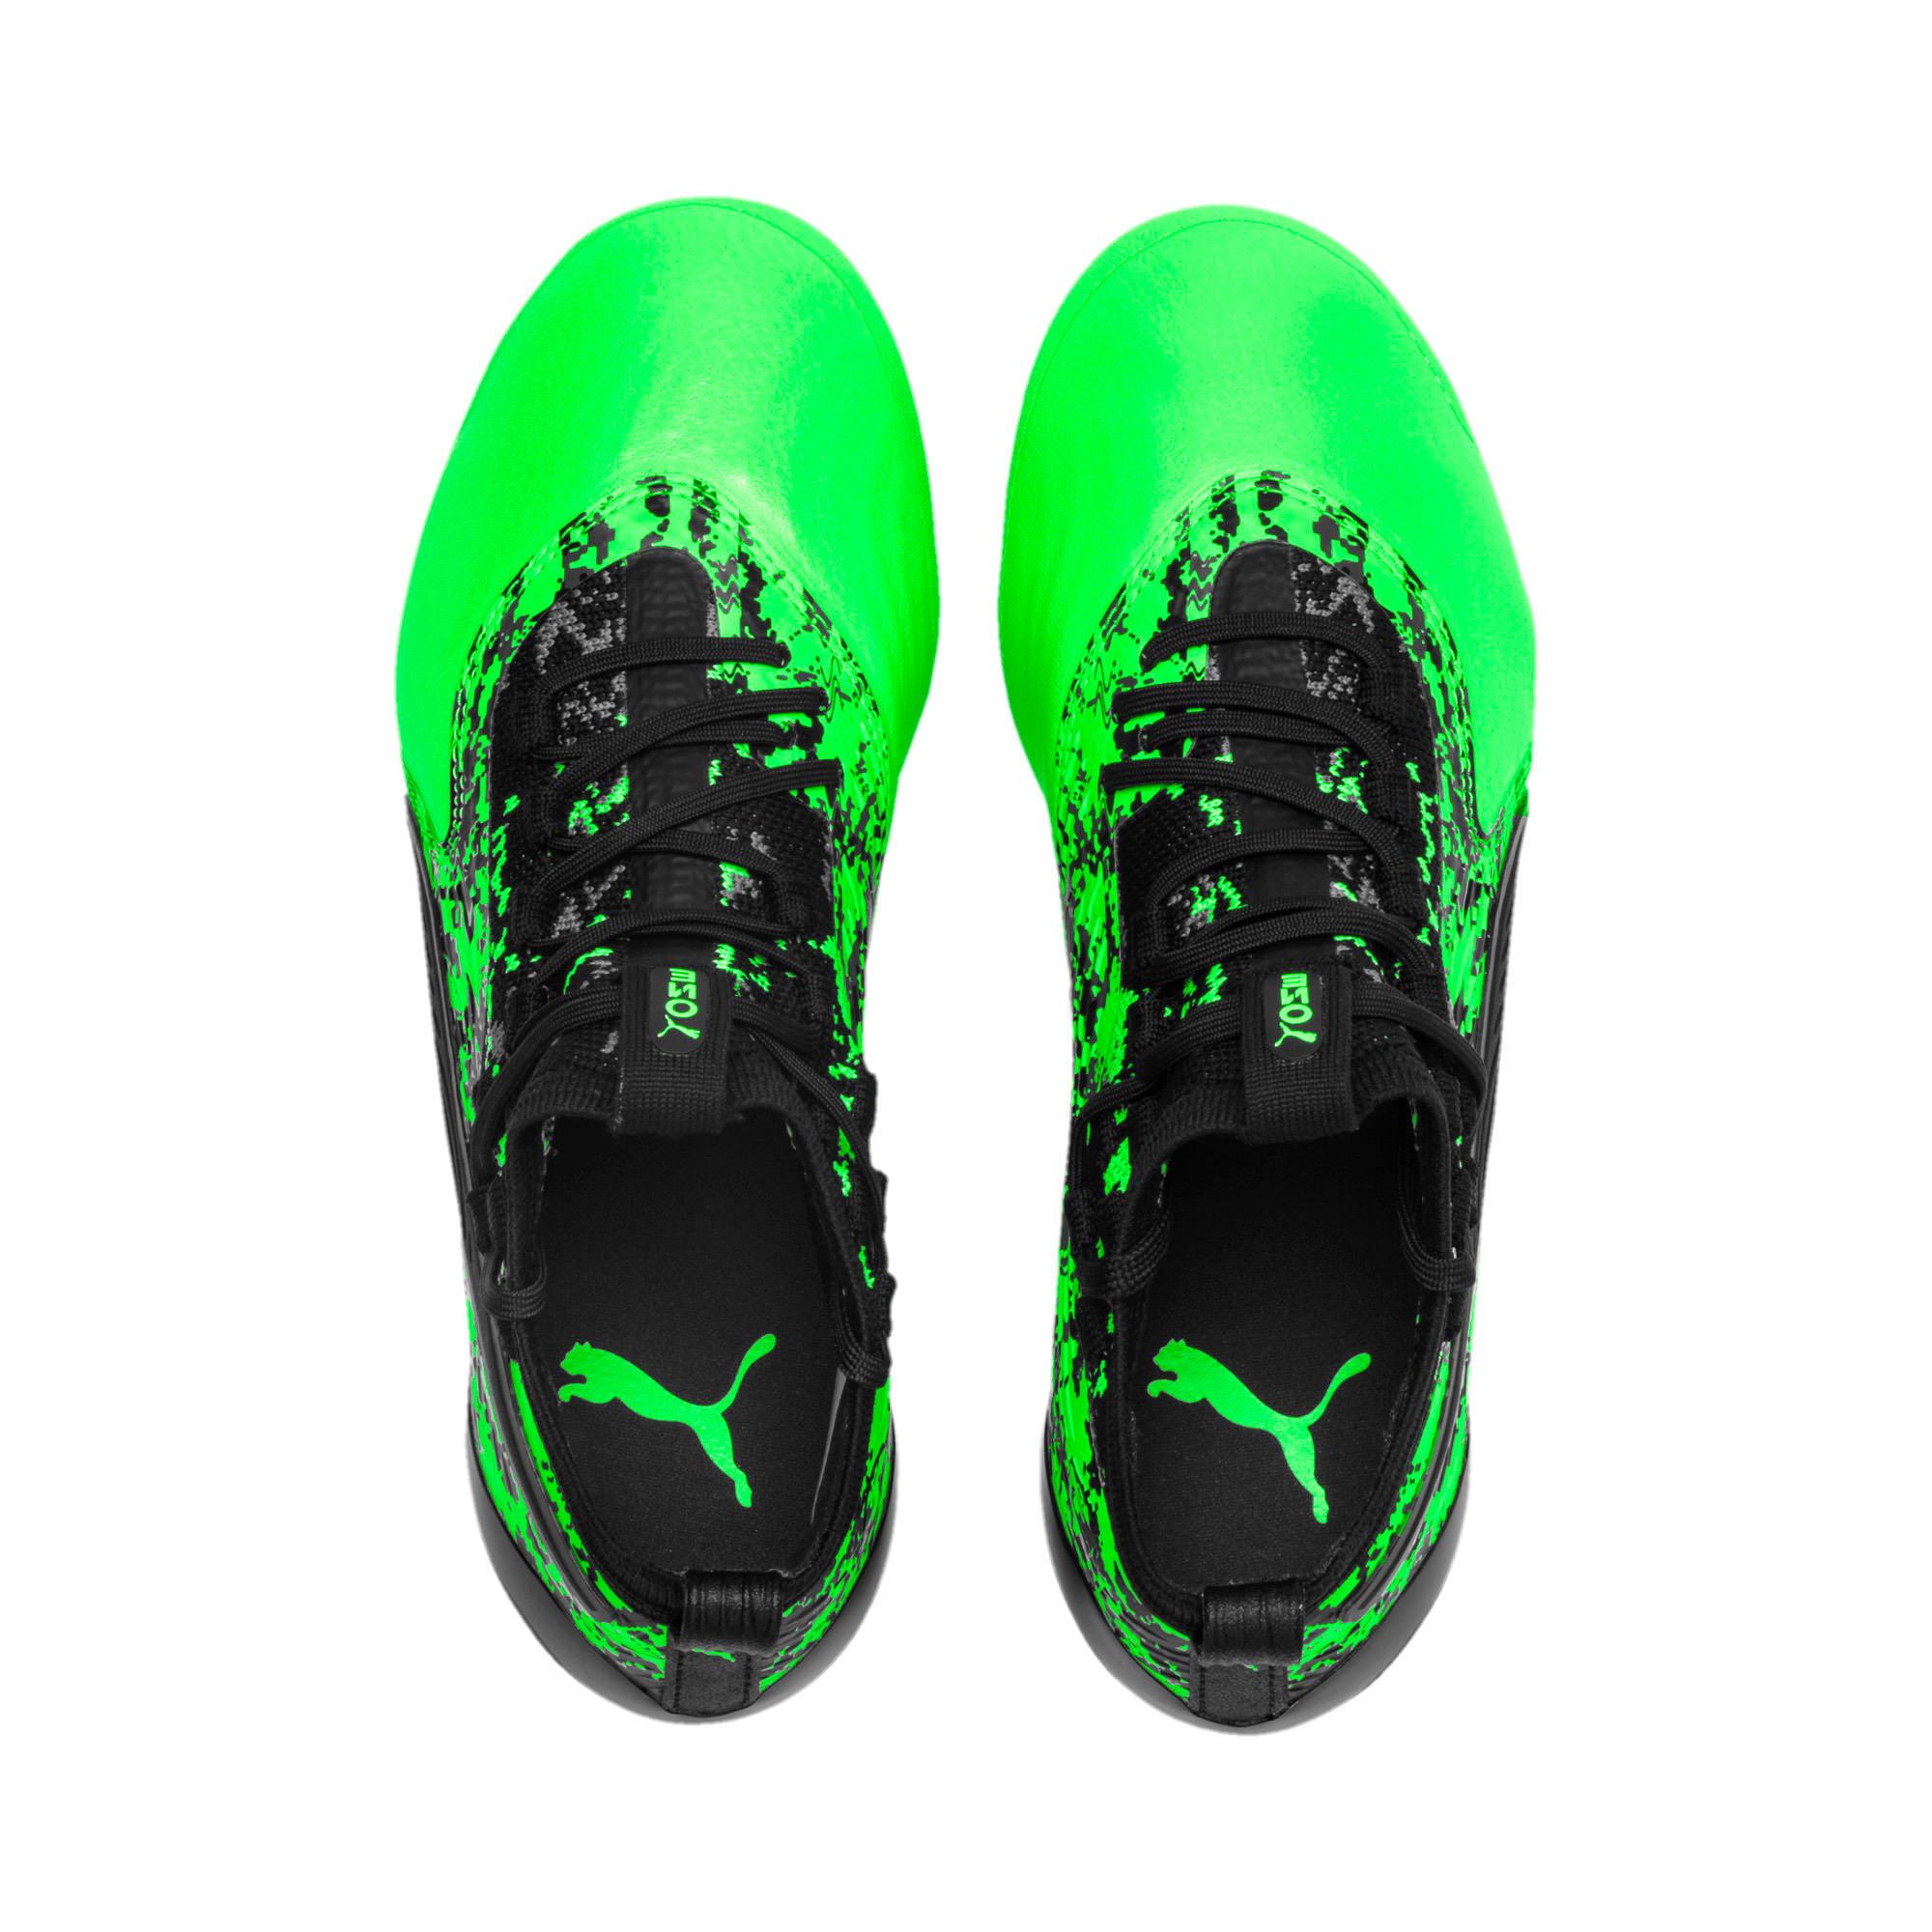 Thumbnail 6 of PUMA ONE 19.1 FG/AG Soccer Cleats JR, Green Gecko-Black-Gray, medium